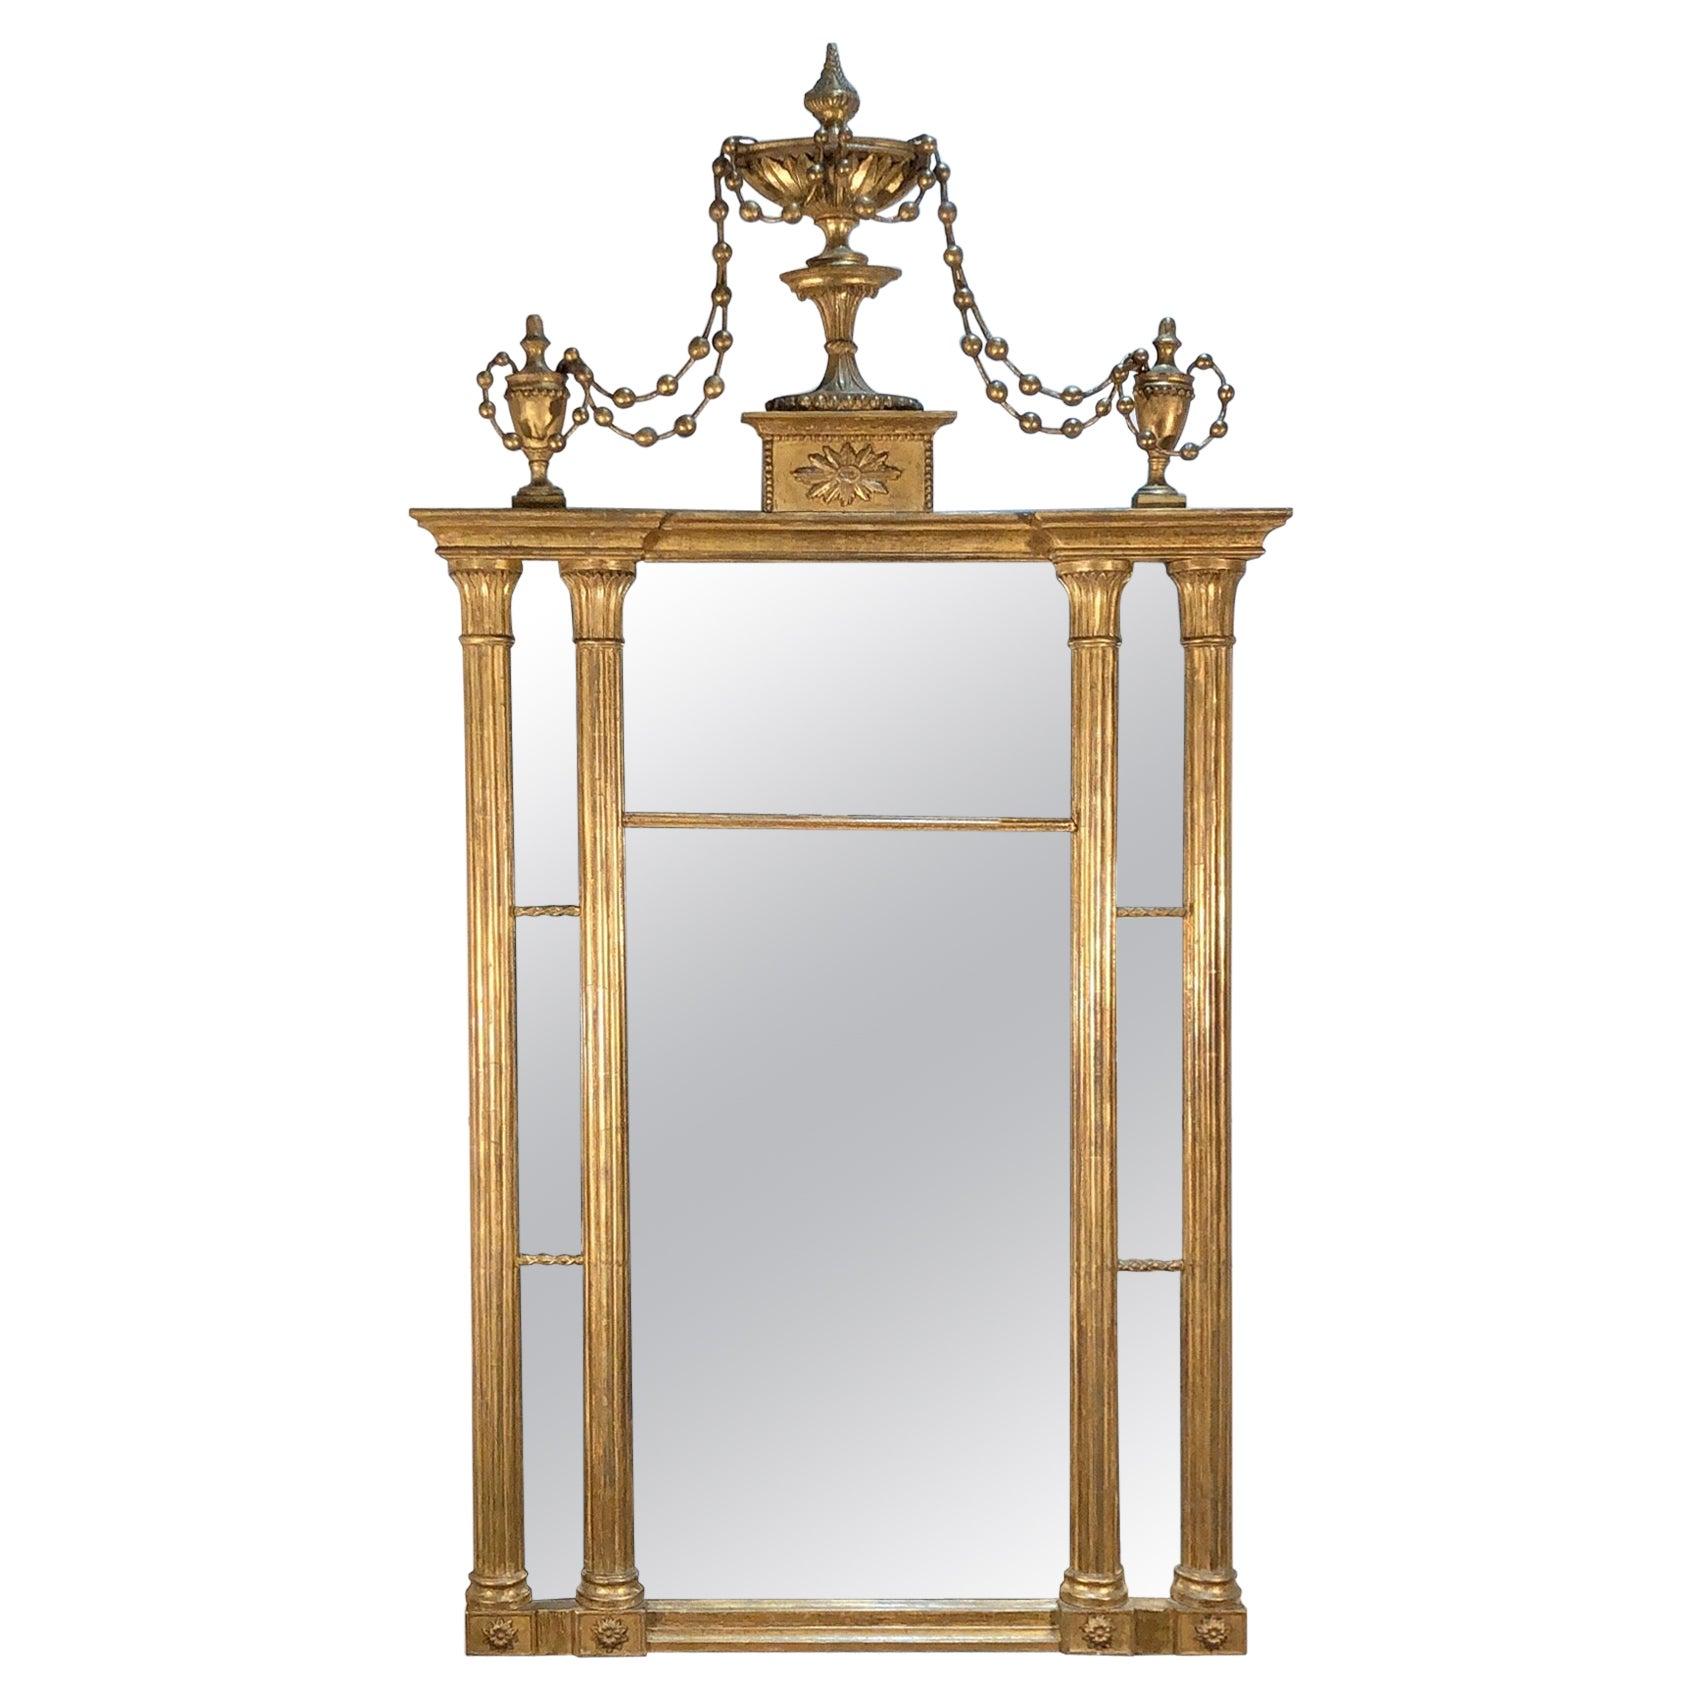 Federal New York Pier Mirror, Late 18th Century